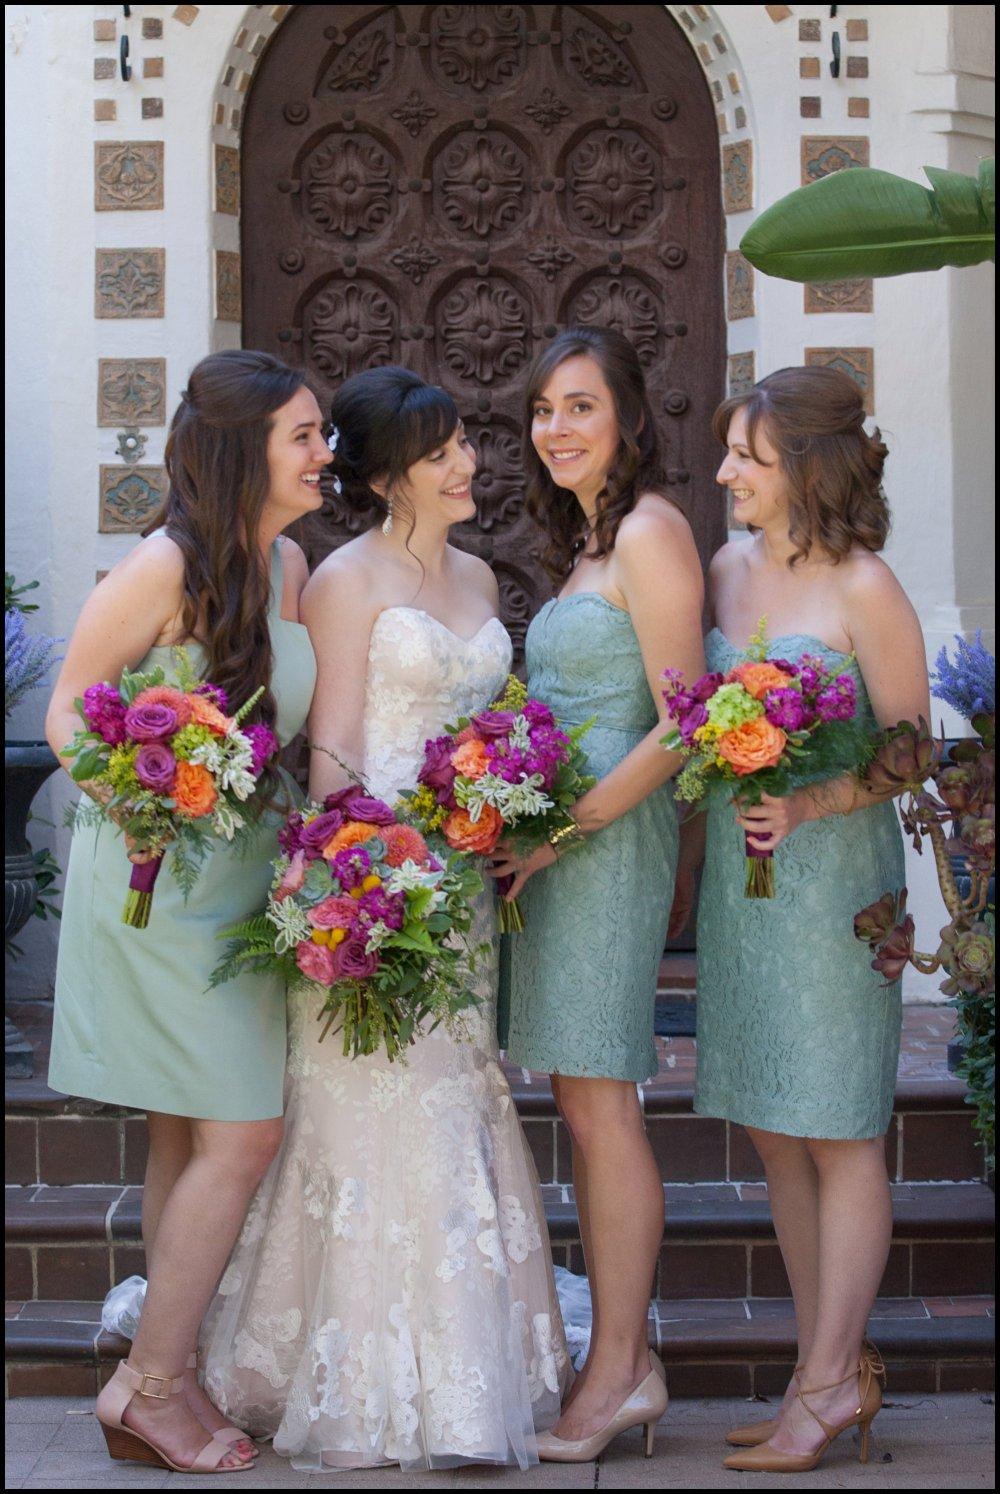 cassia_karin_lux_aeterna_photography_lili_and_max_wedding_ojai_california_acacia_mansion_blog_favorites-137.jpg